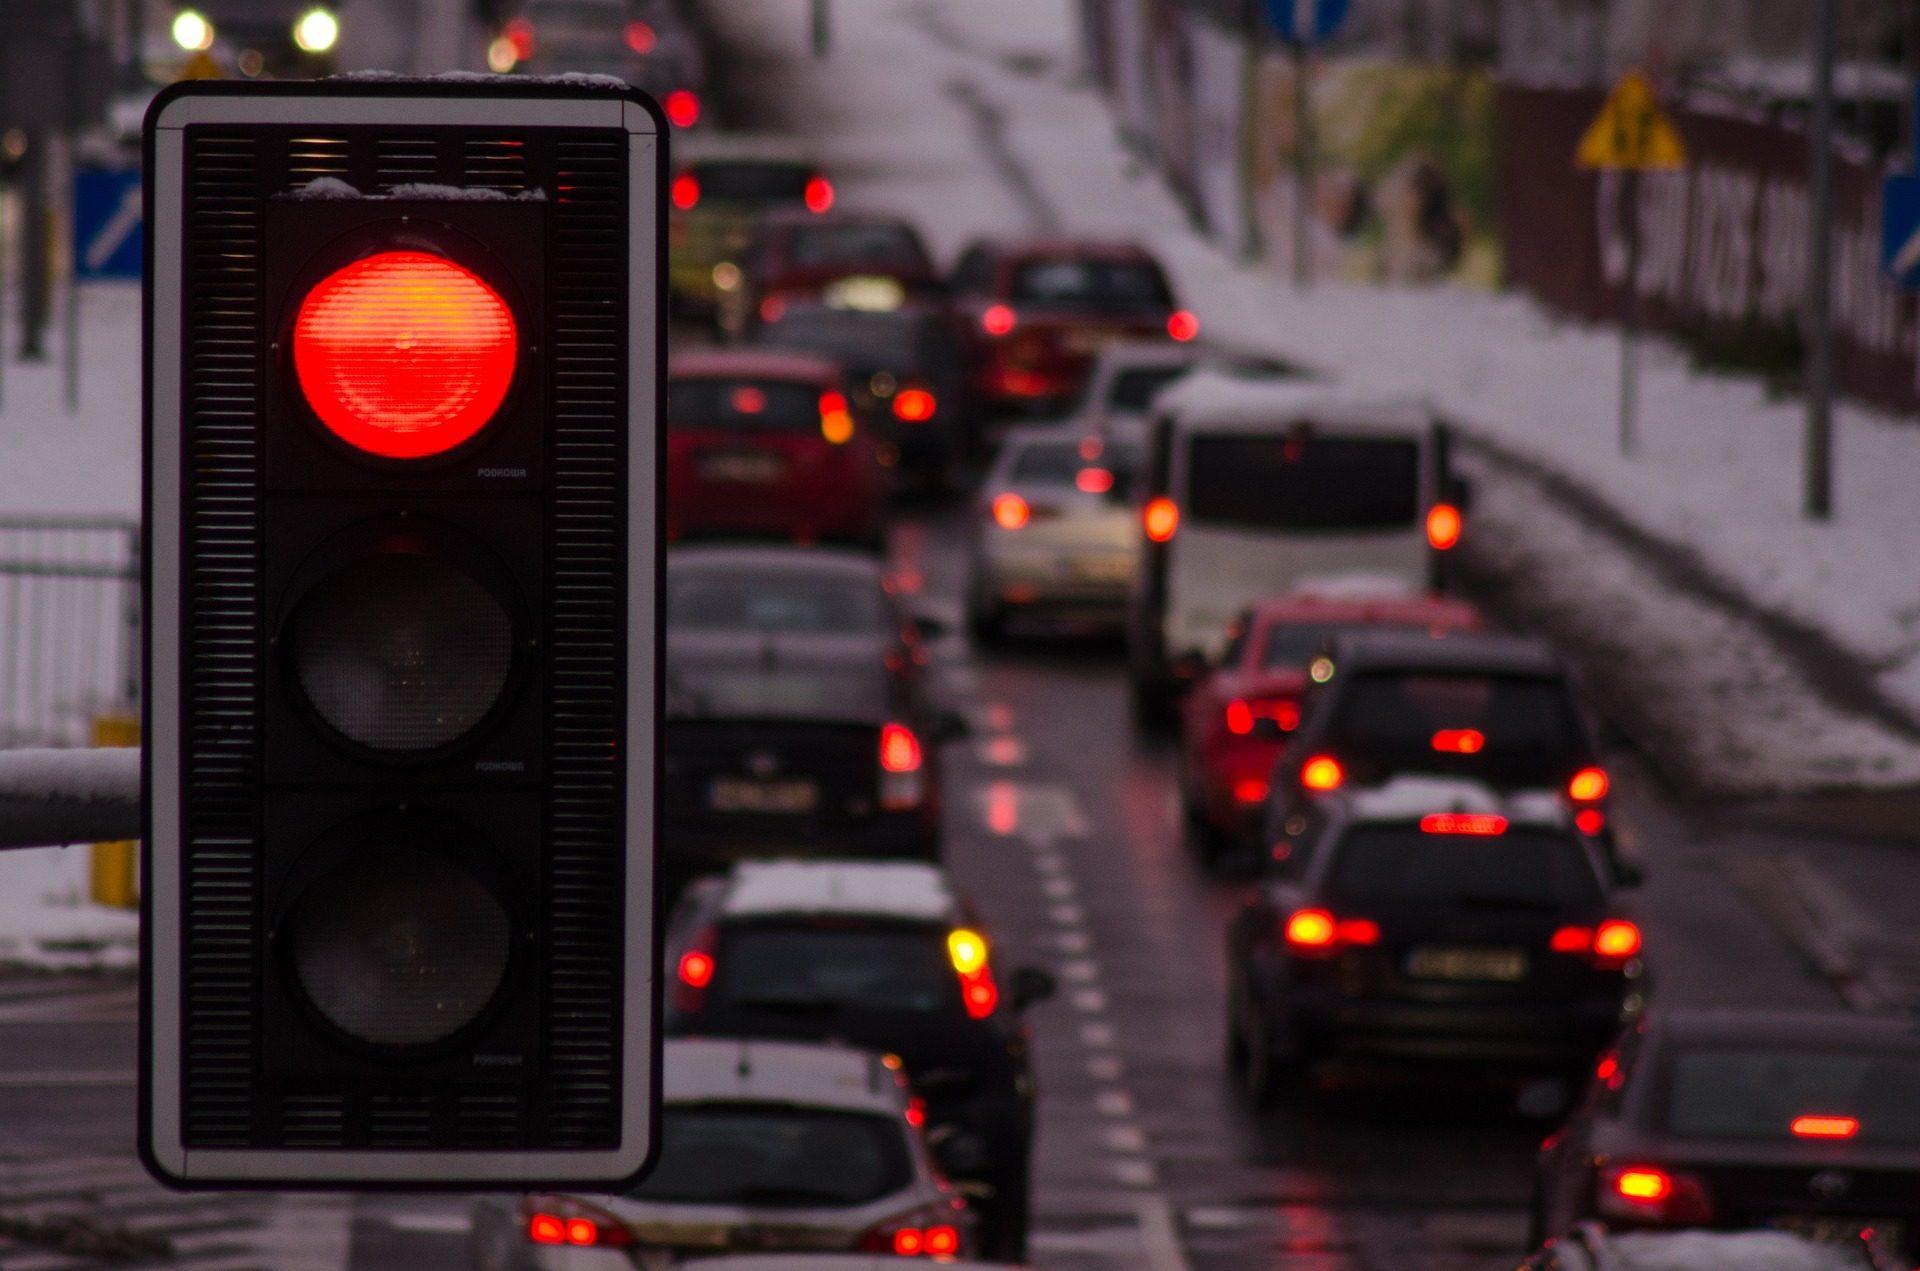 Ampel, Verkehr, Jam, Stadt, Autos - Wallpaper HD - Prof.-falken.com